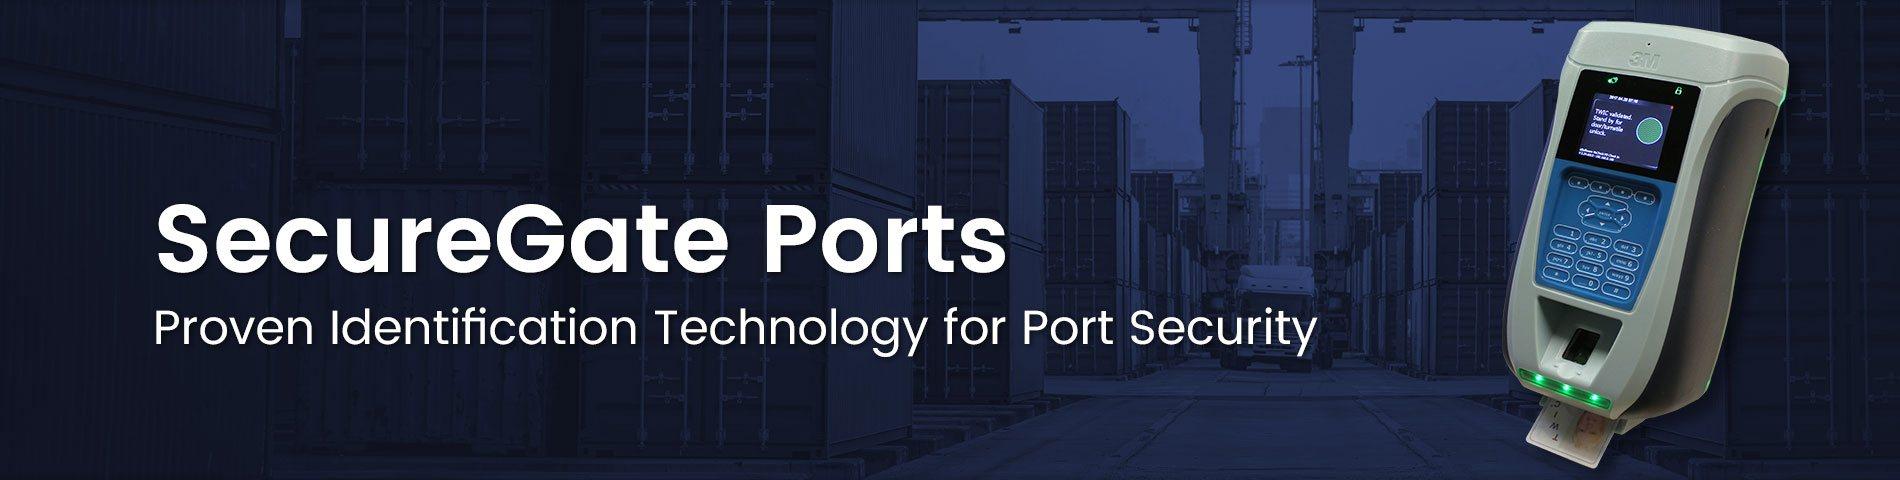 SecureGate Ports